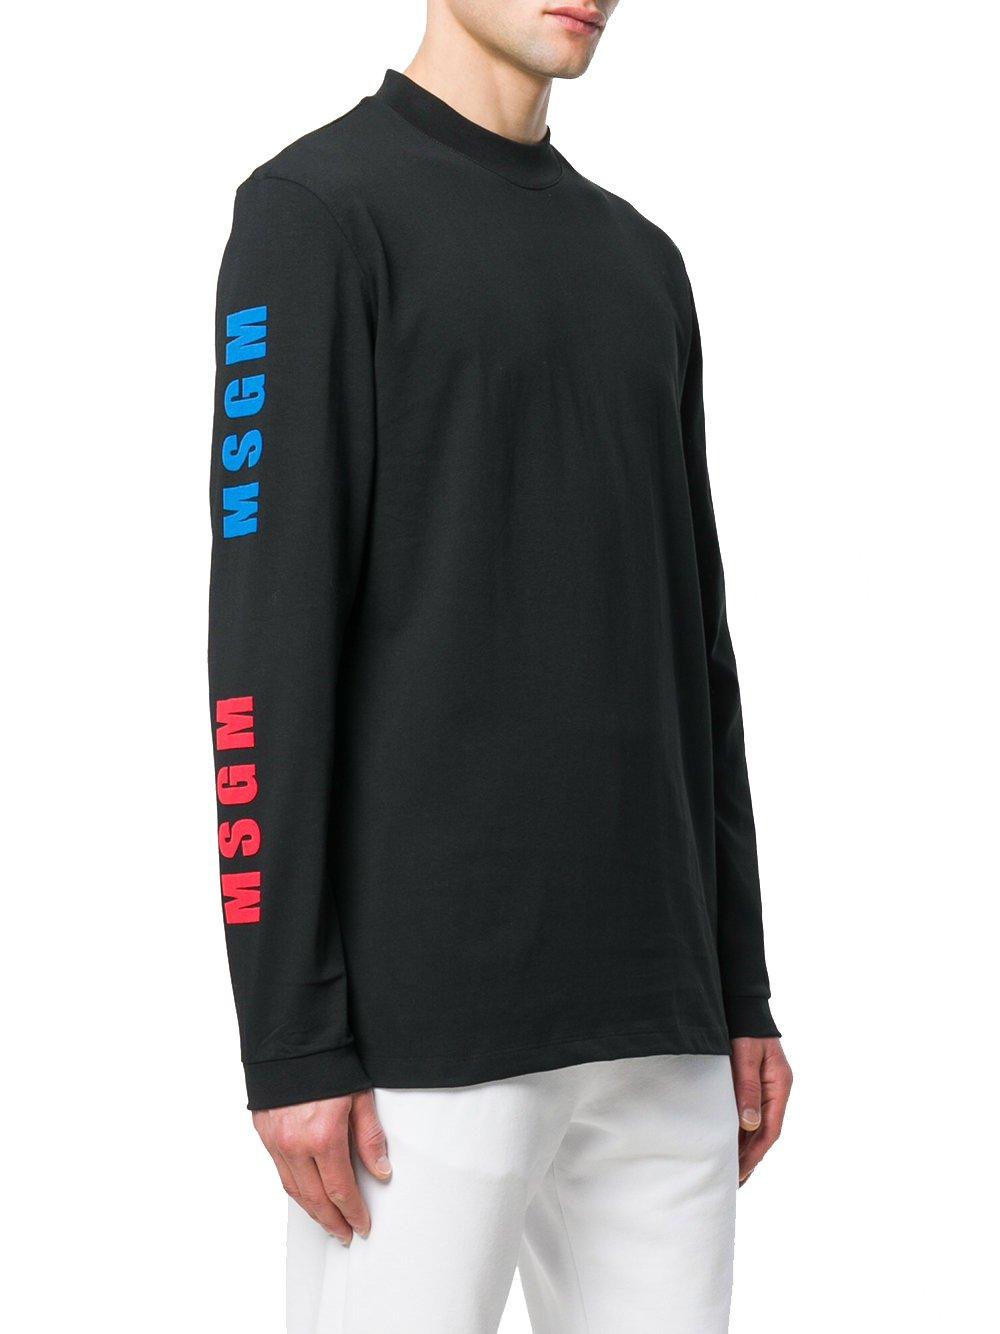 MSGM Men's 2440Mm10318429999 Black Cotton Sweatshirt